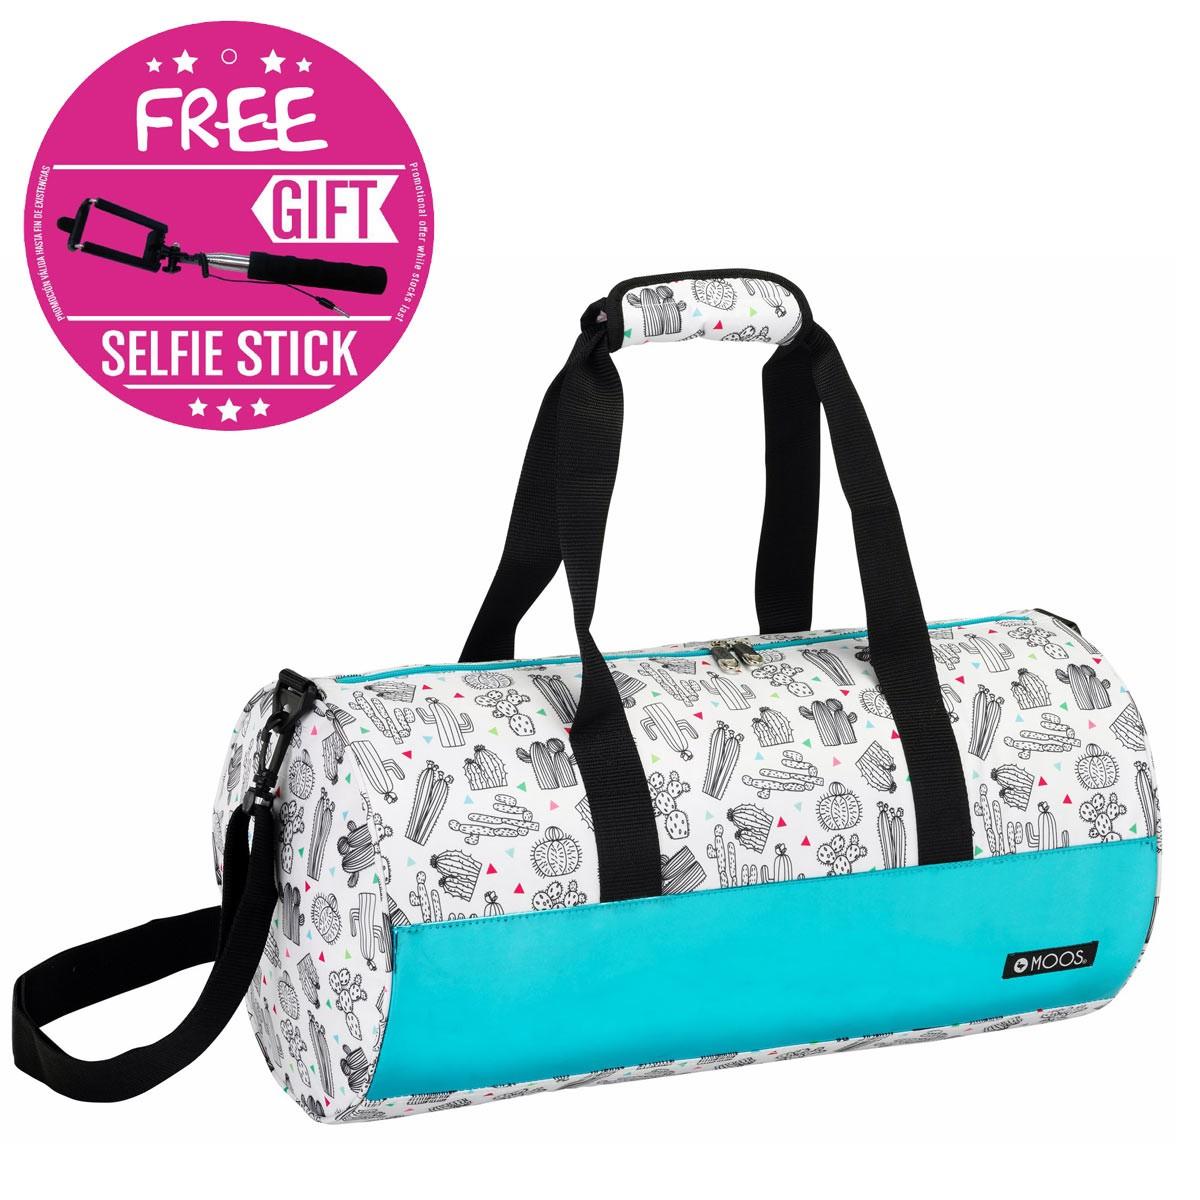 Designer Moos Cactus Roll Travel Bag + FREE SELFIE STICK – image 1